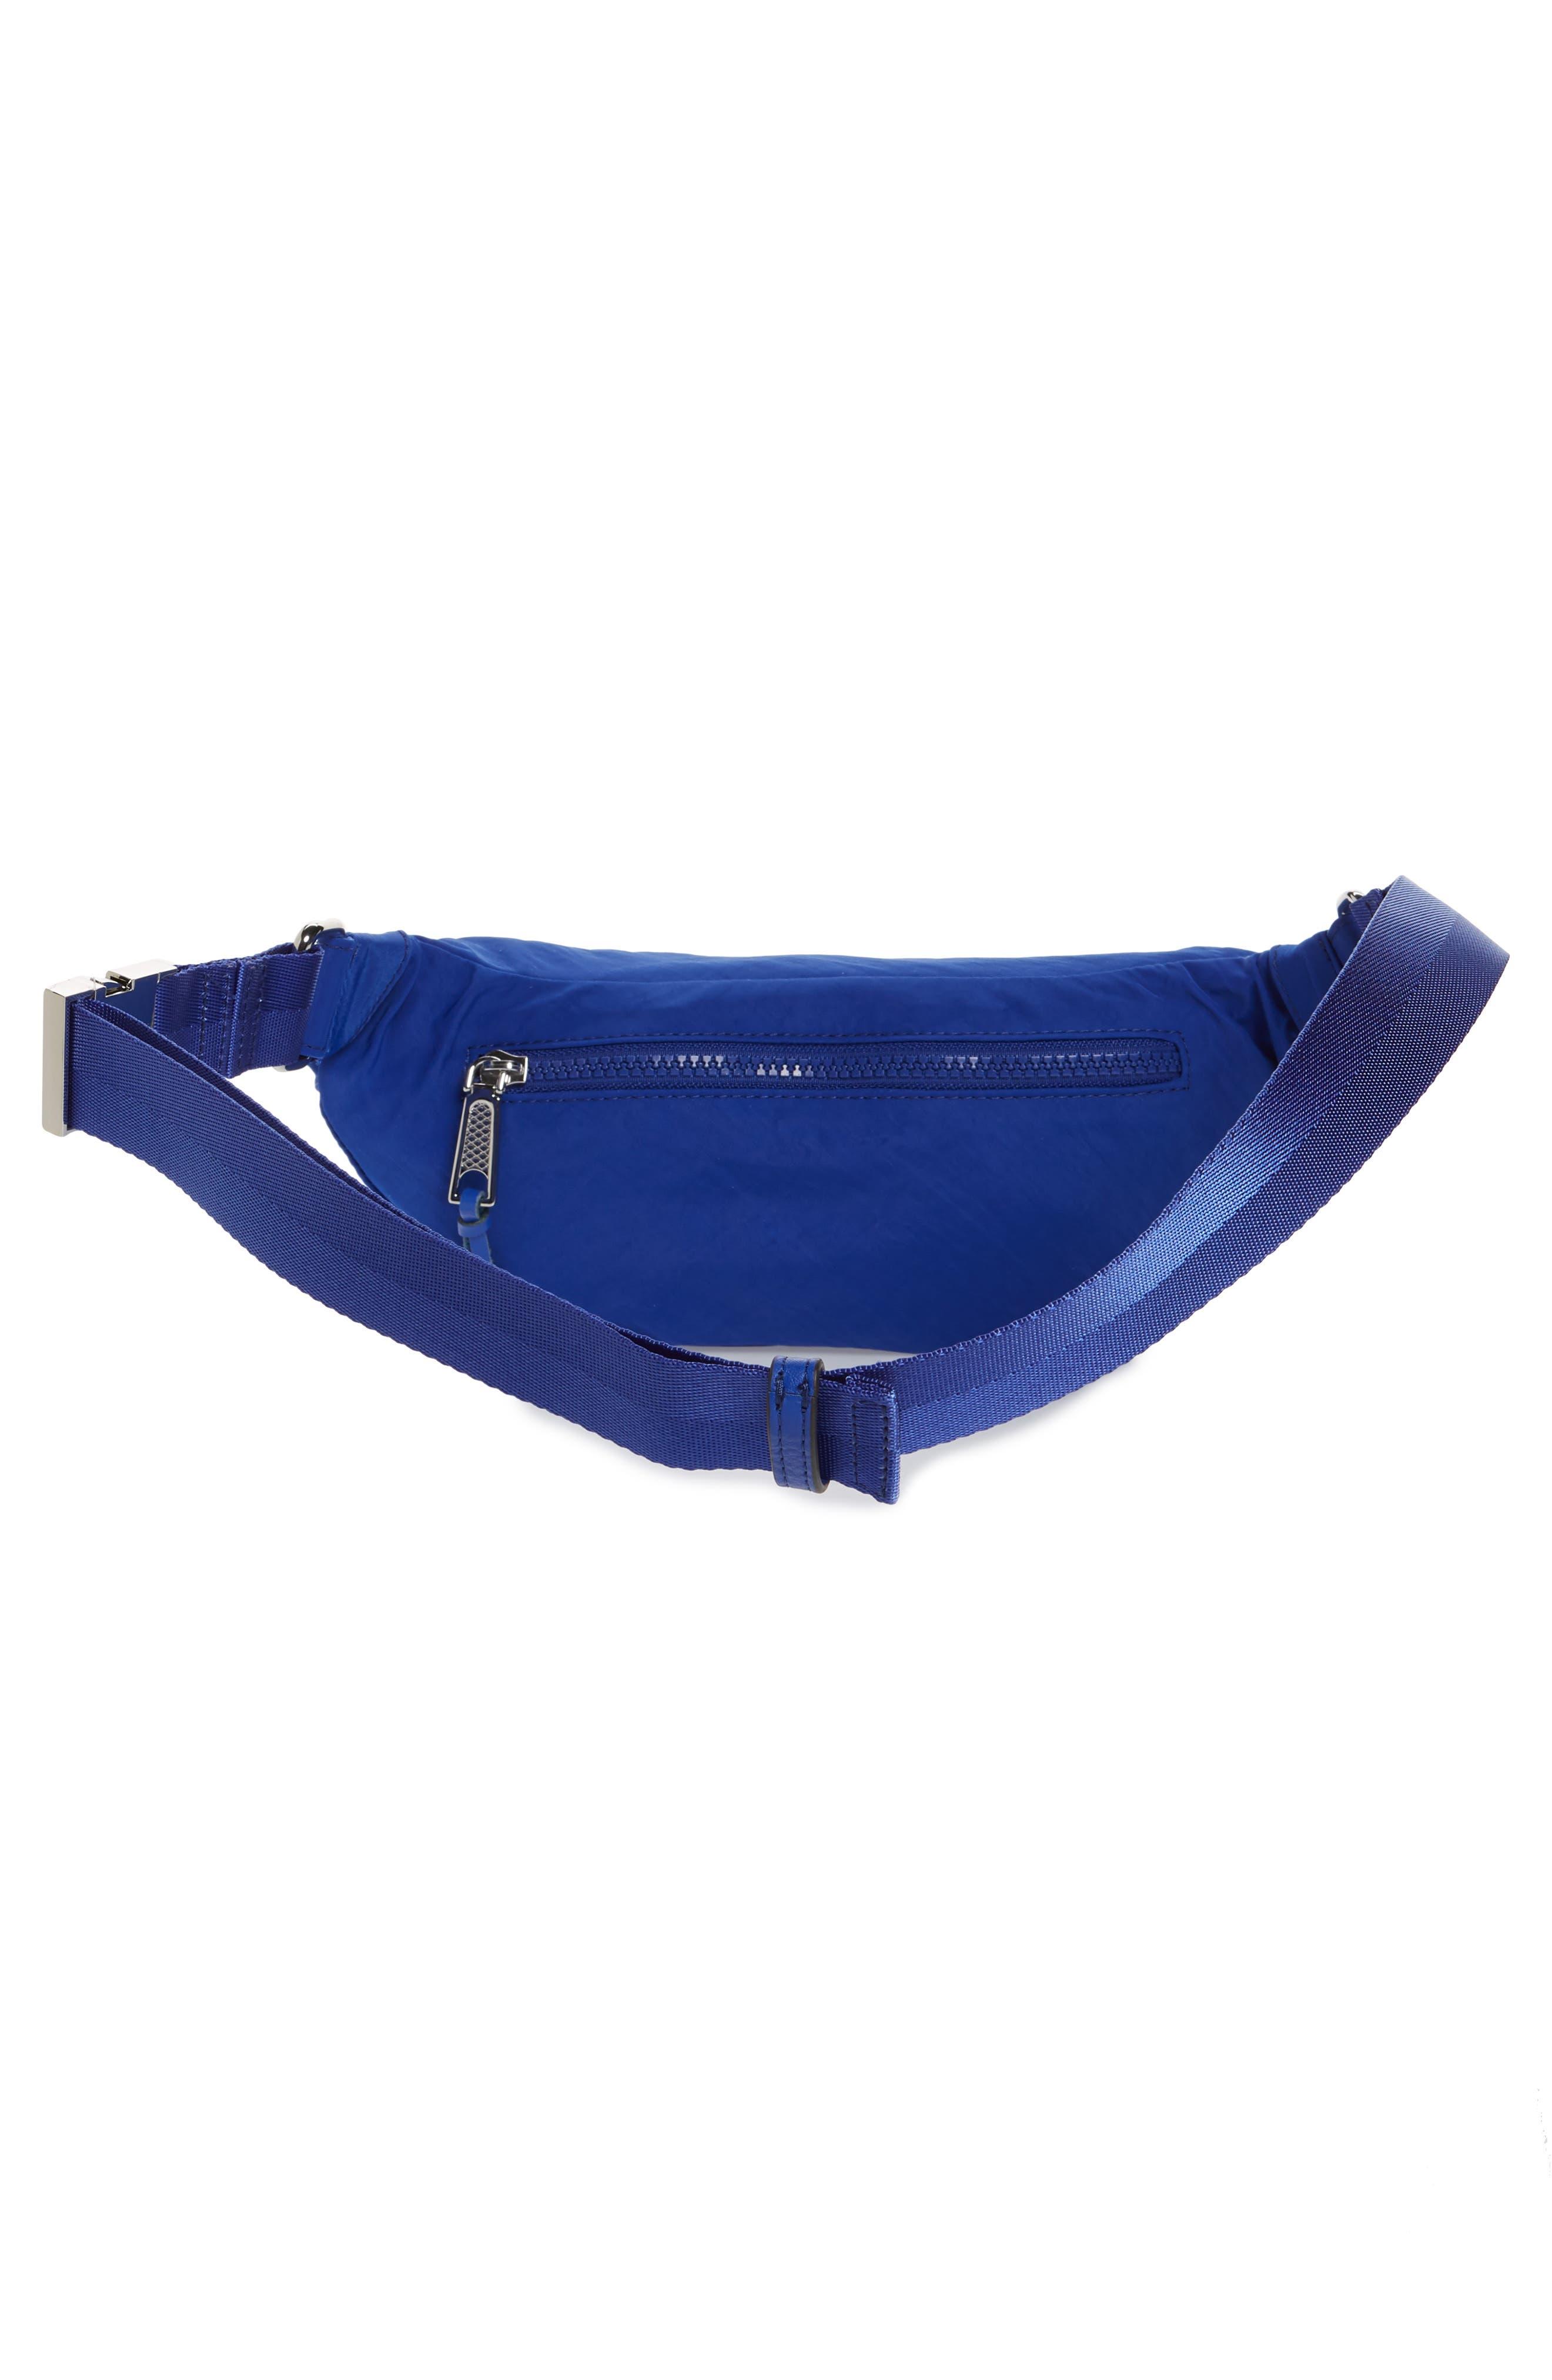 REBECCA MINKOFF, Nylon Belt Bag, Alternate thumbnail 5, color, BRIGHT BLUE